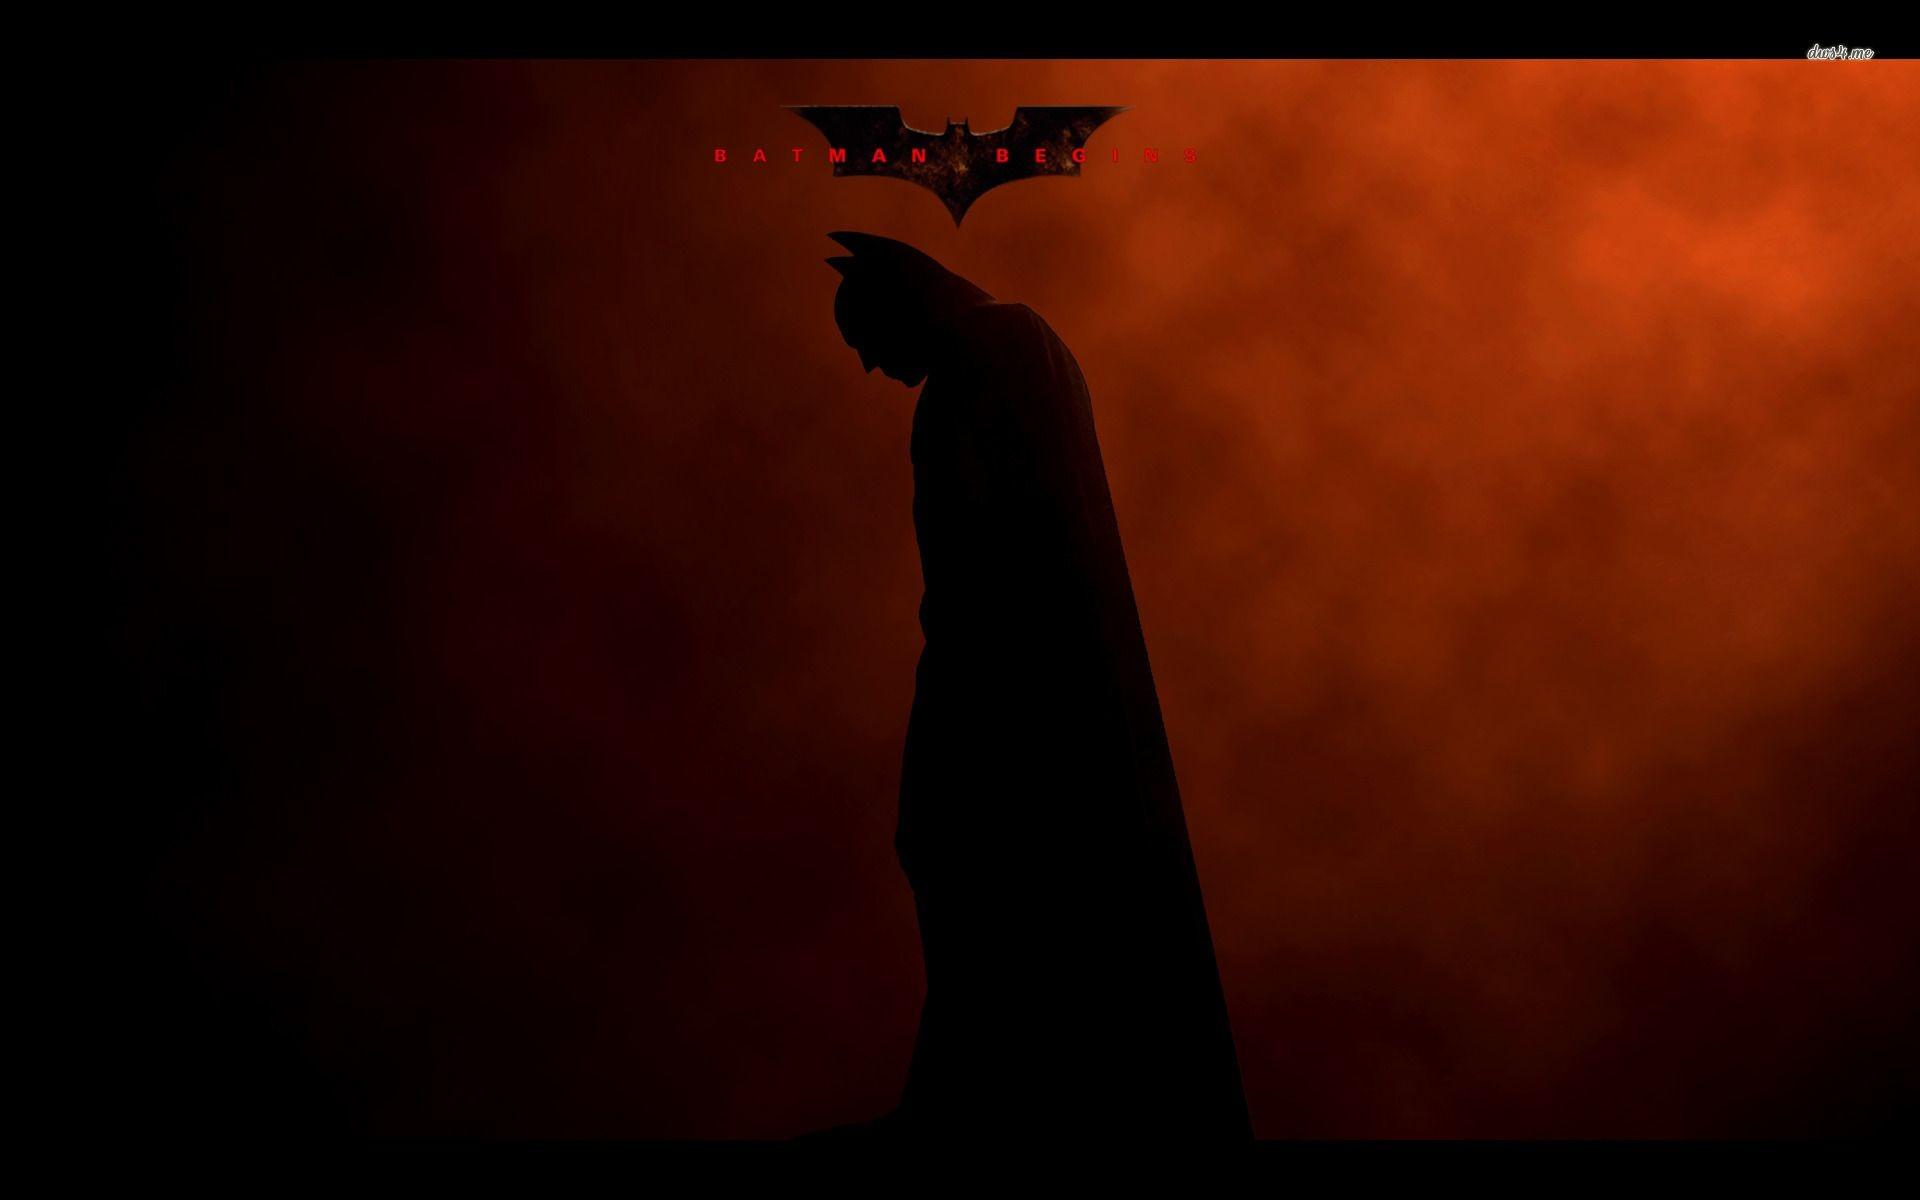 Batman logo and shadow wallpaper